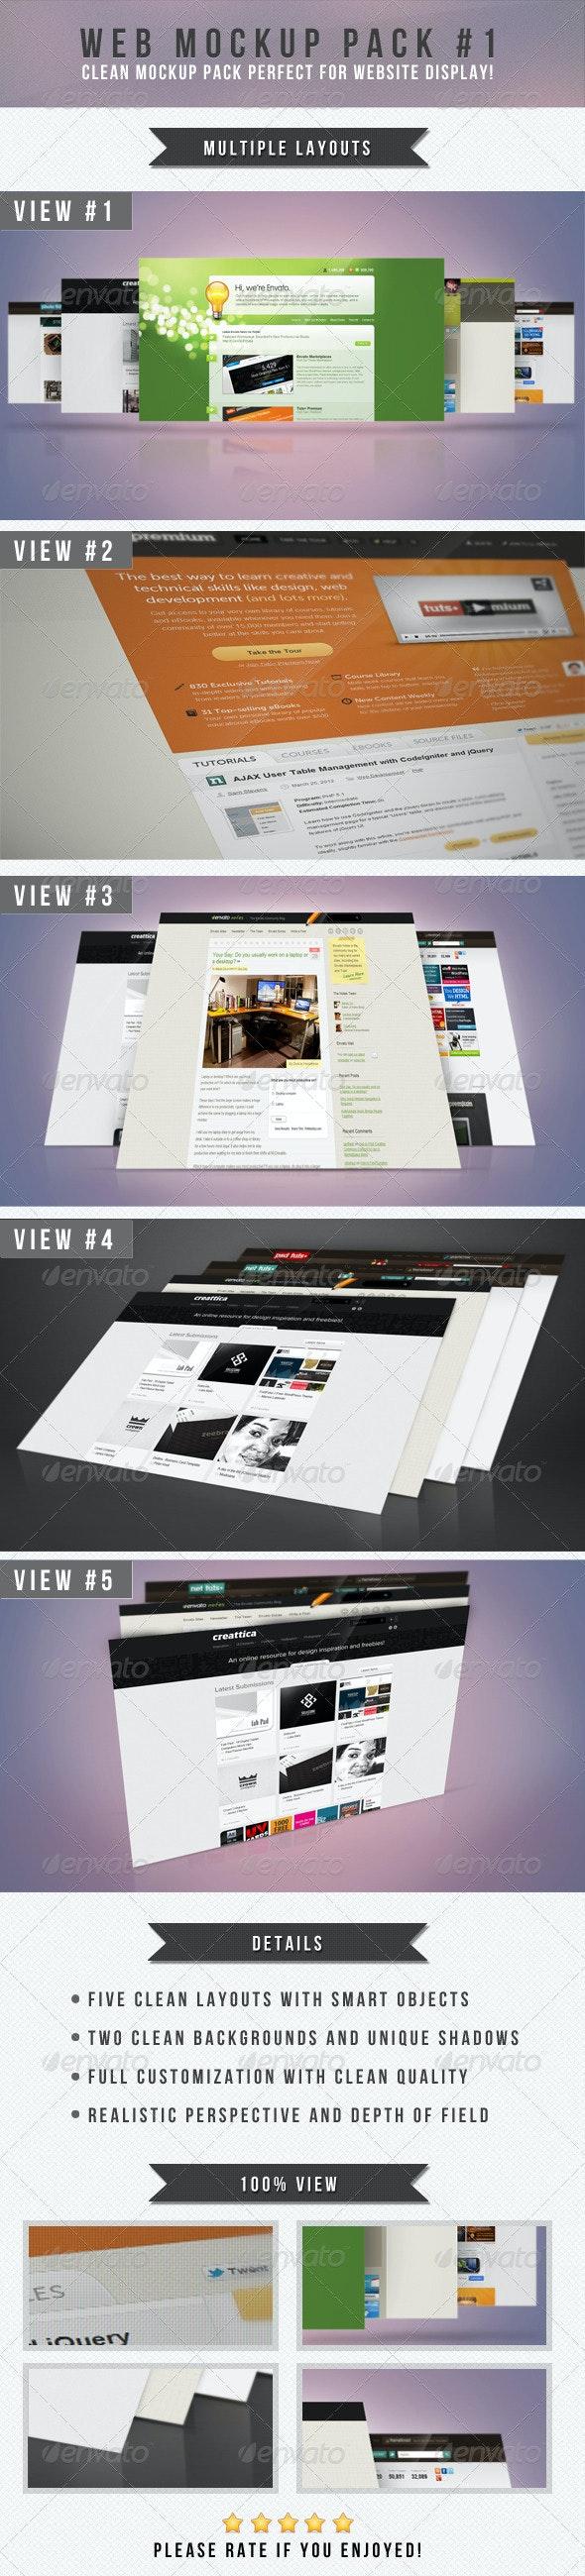 Web Mockup Pack #1 - Website Displays